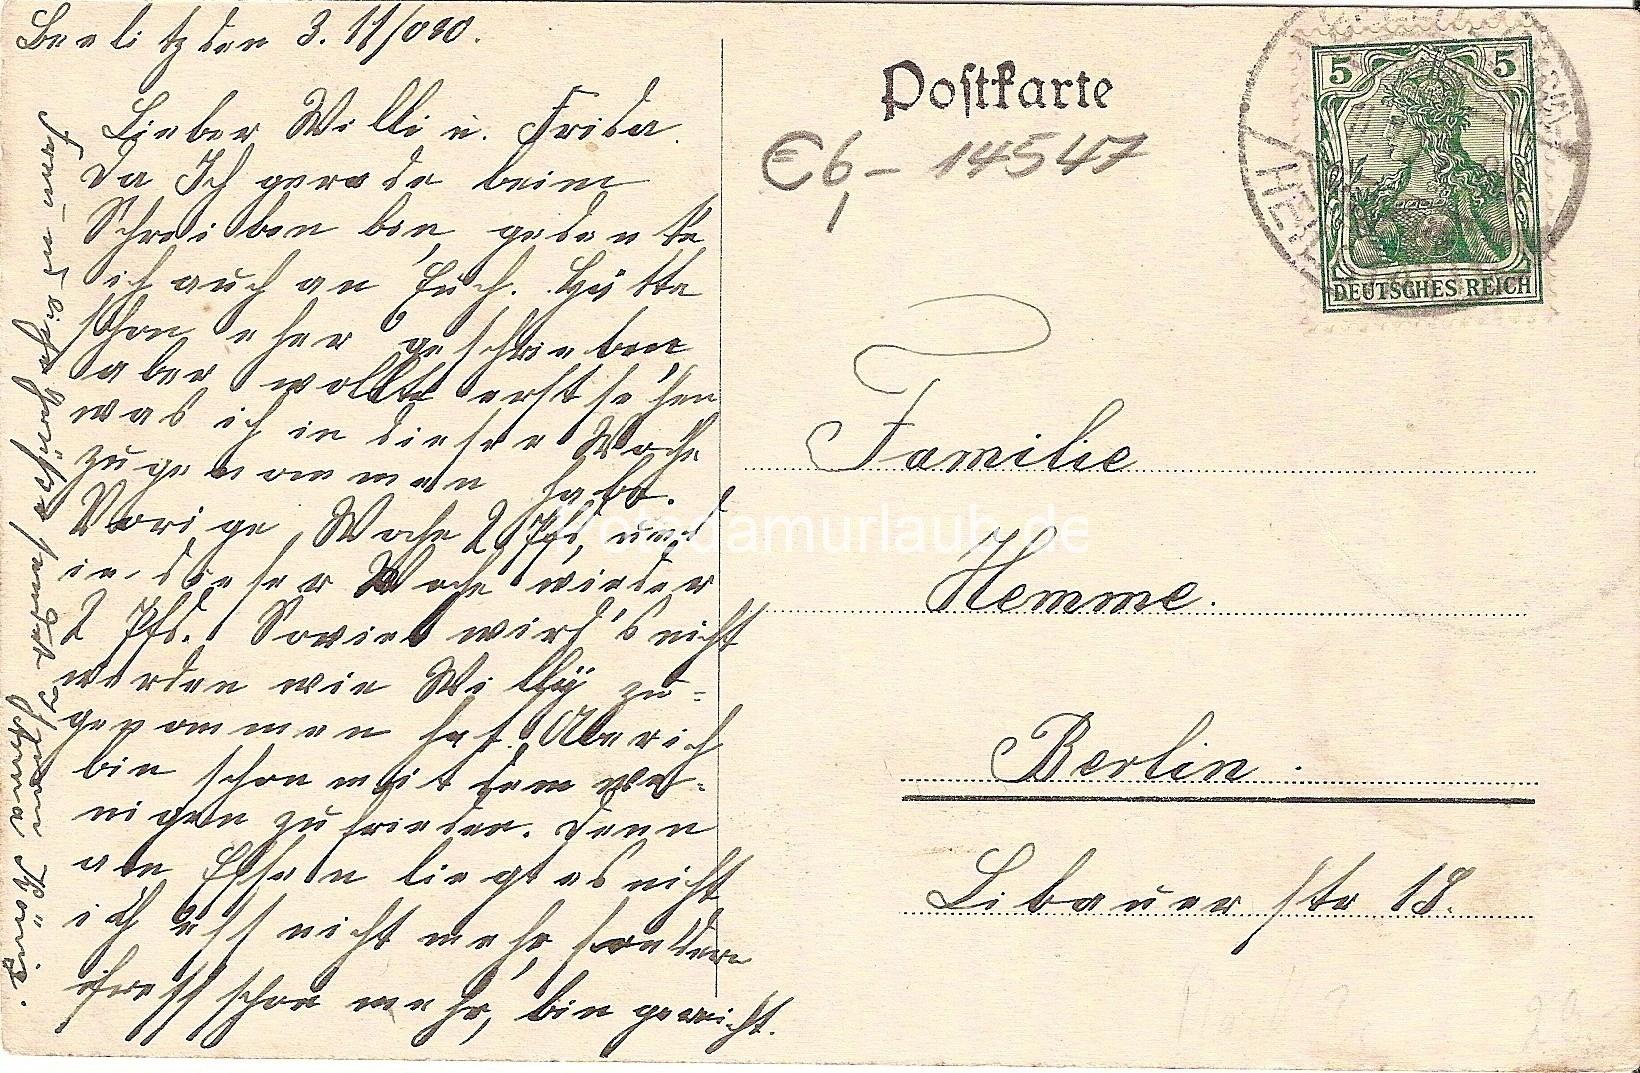 1910 11 03